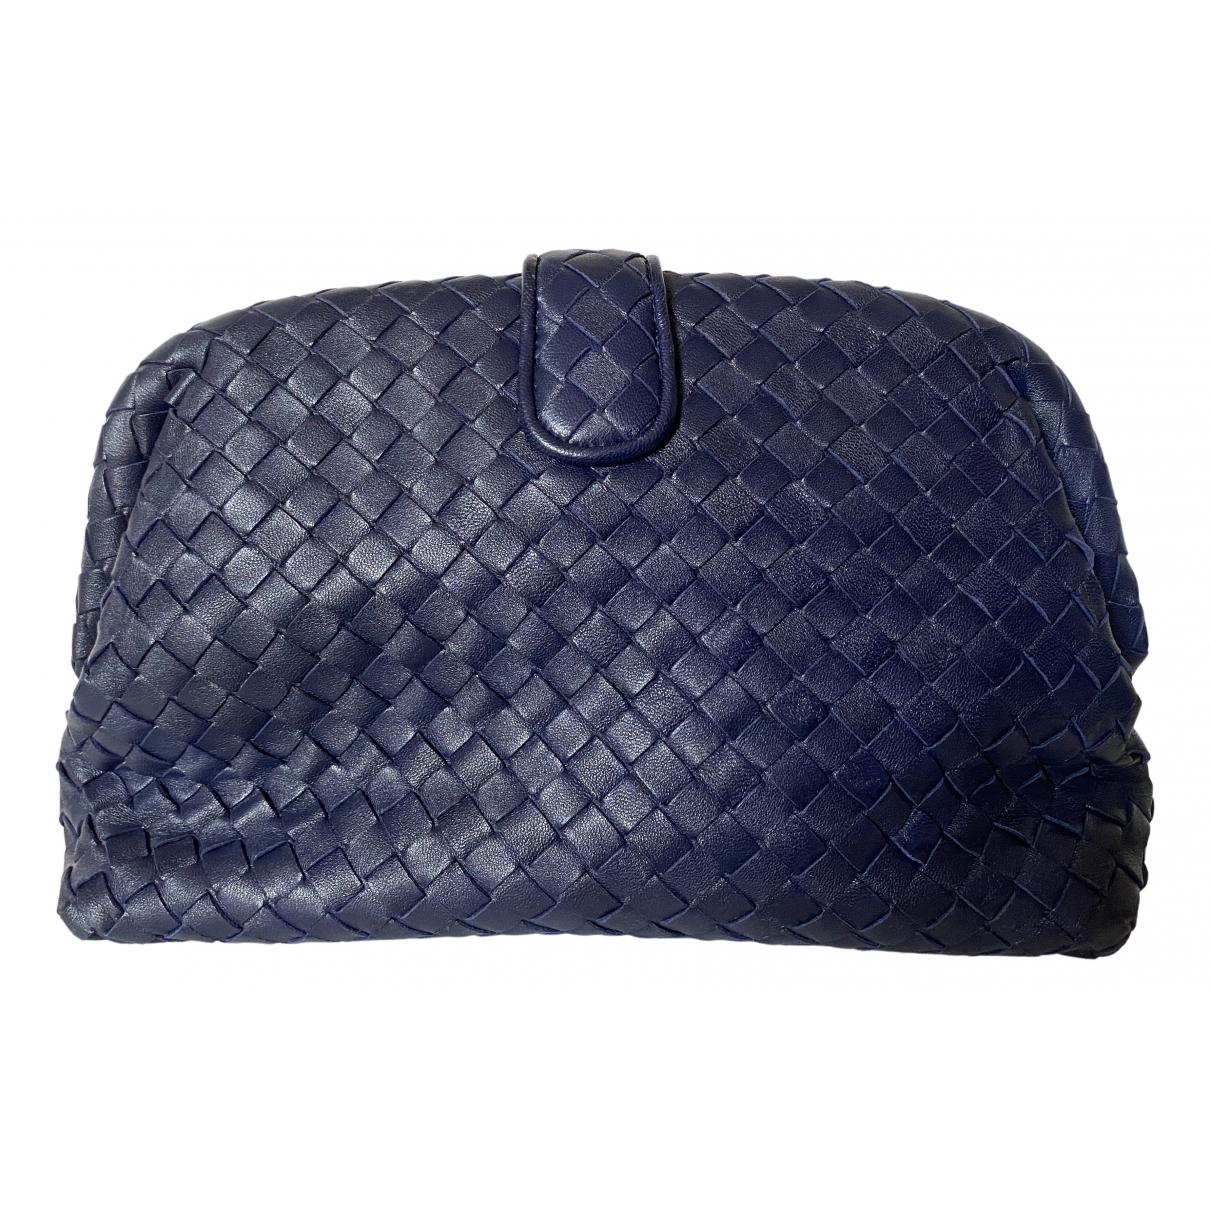 Bottega Veneta - Pochette   pour femme en cuir - bleu